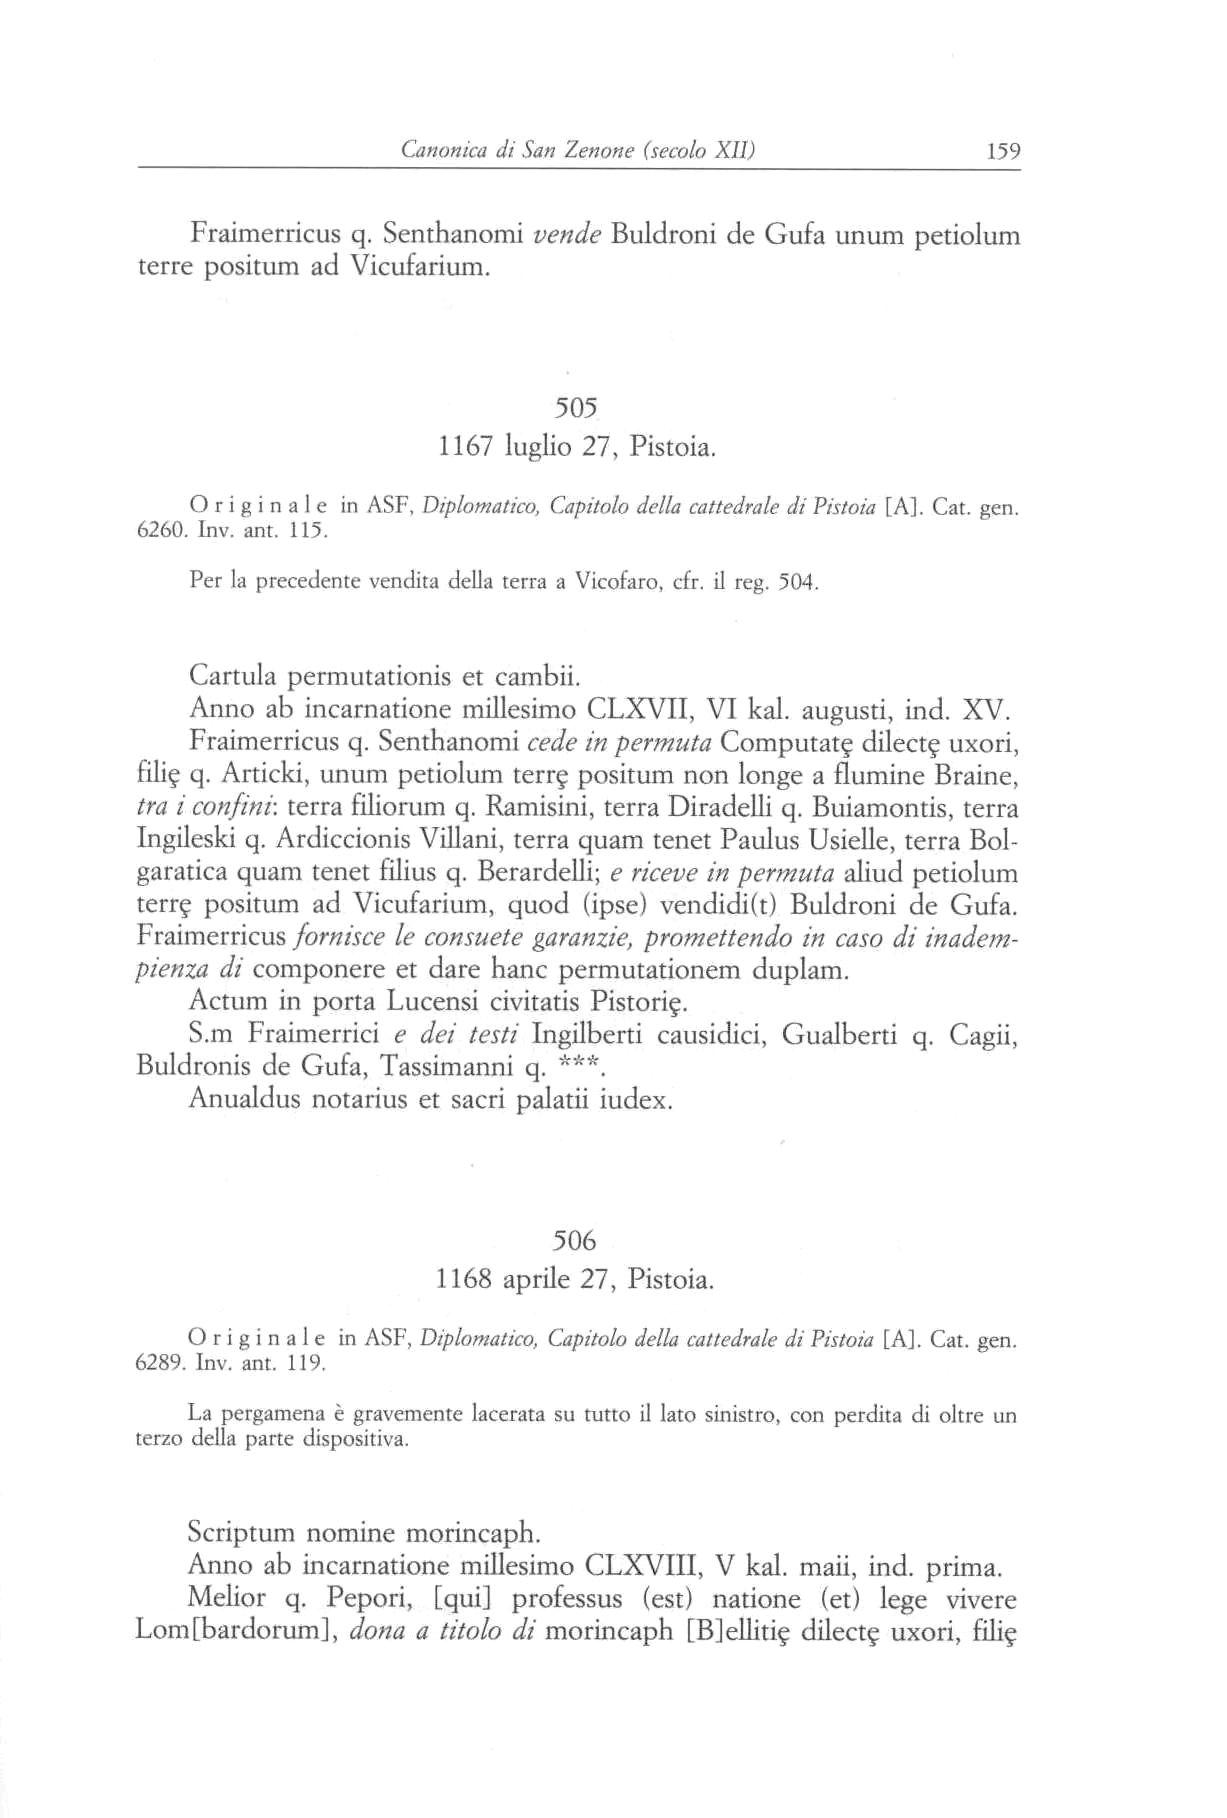 Canonica S. Zenone XII 0159.jpg